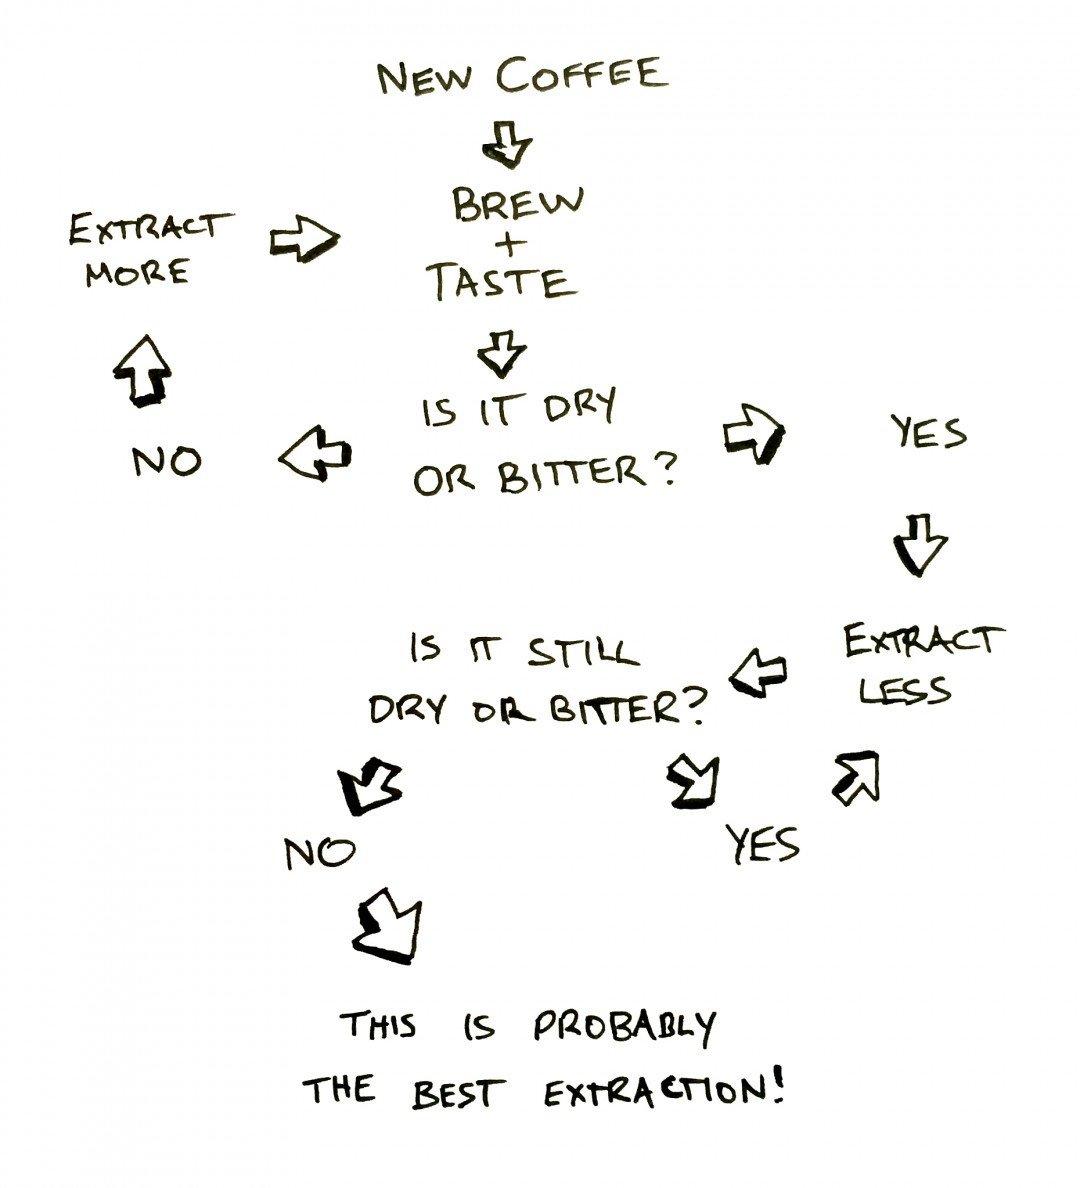 Coffee Extraction